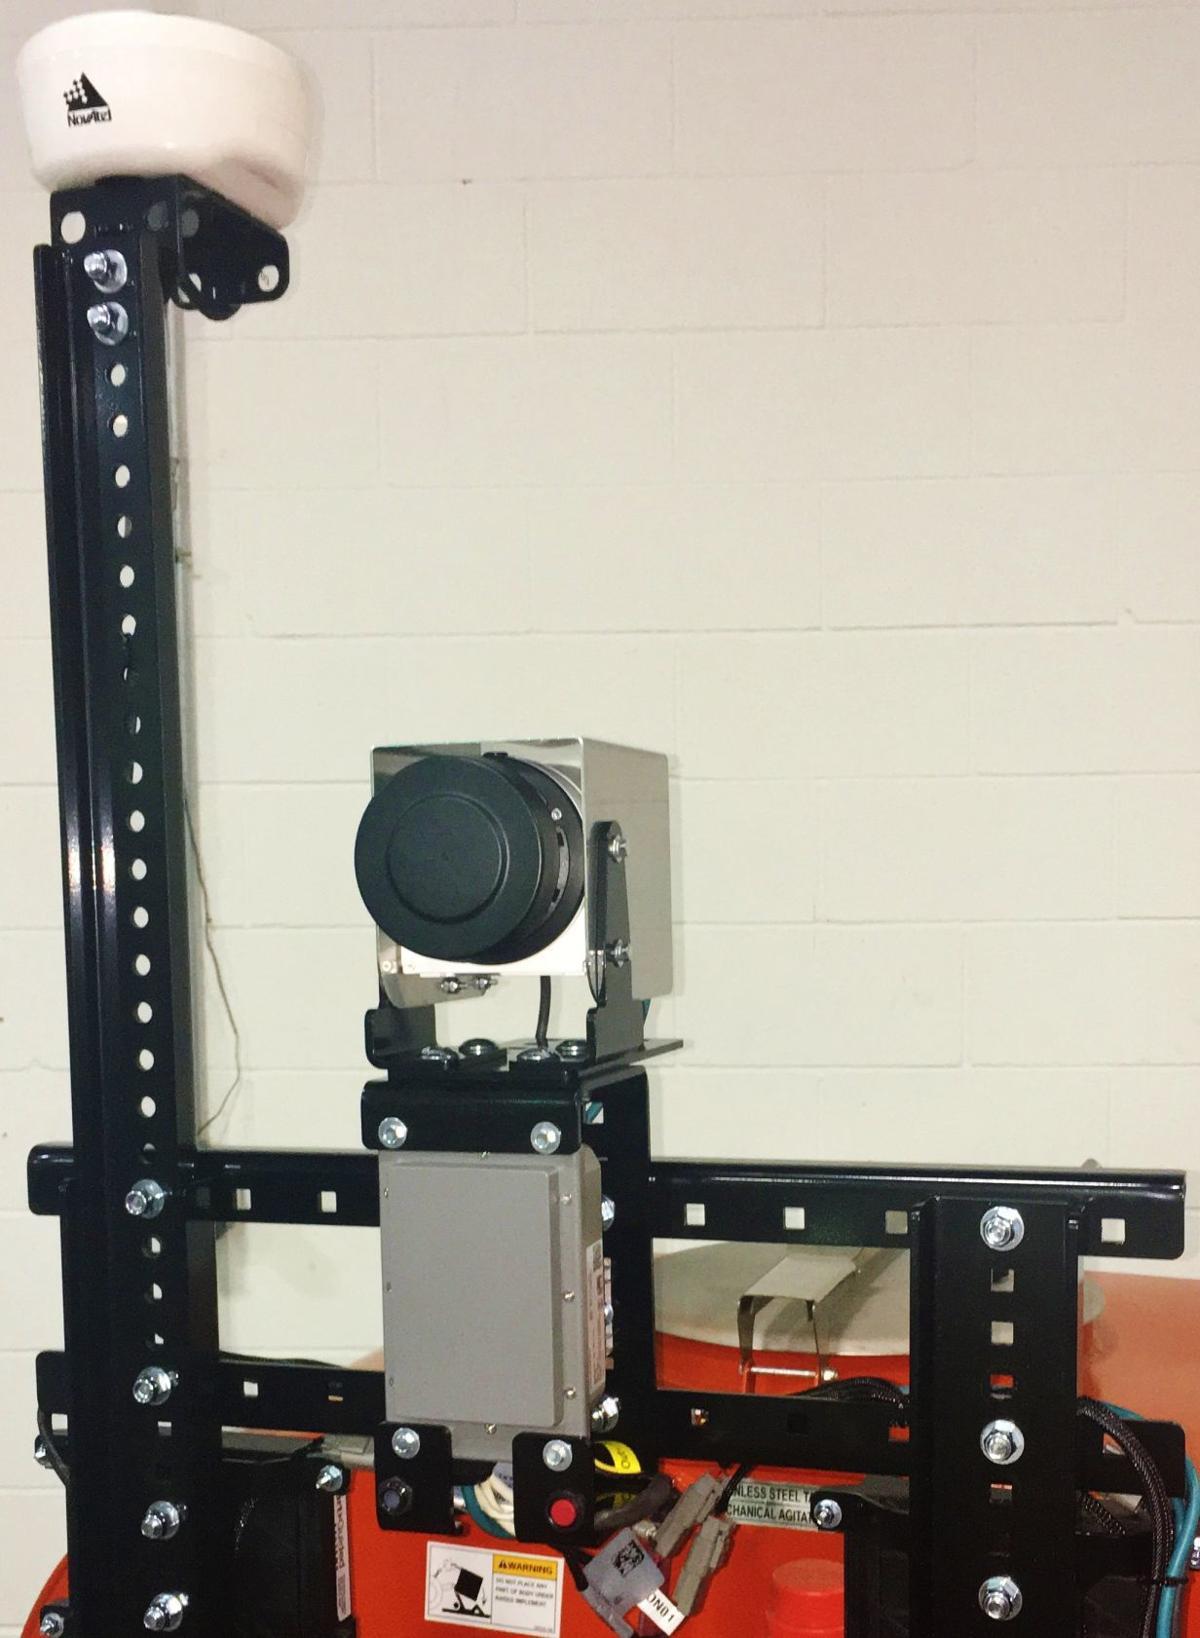 Smart-Apply Intelligent Spray Control System